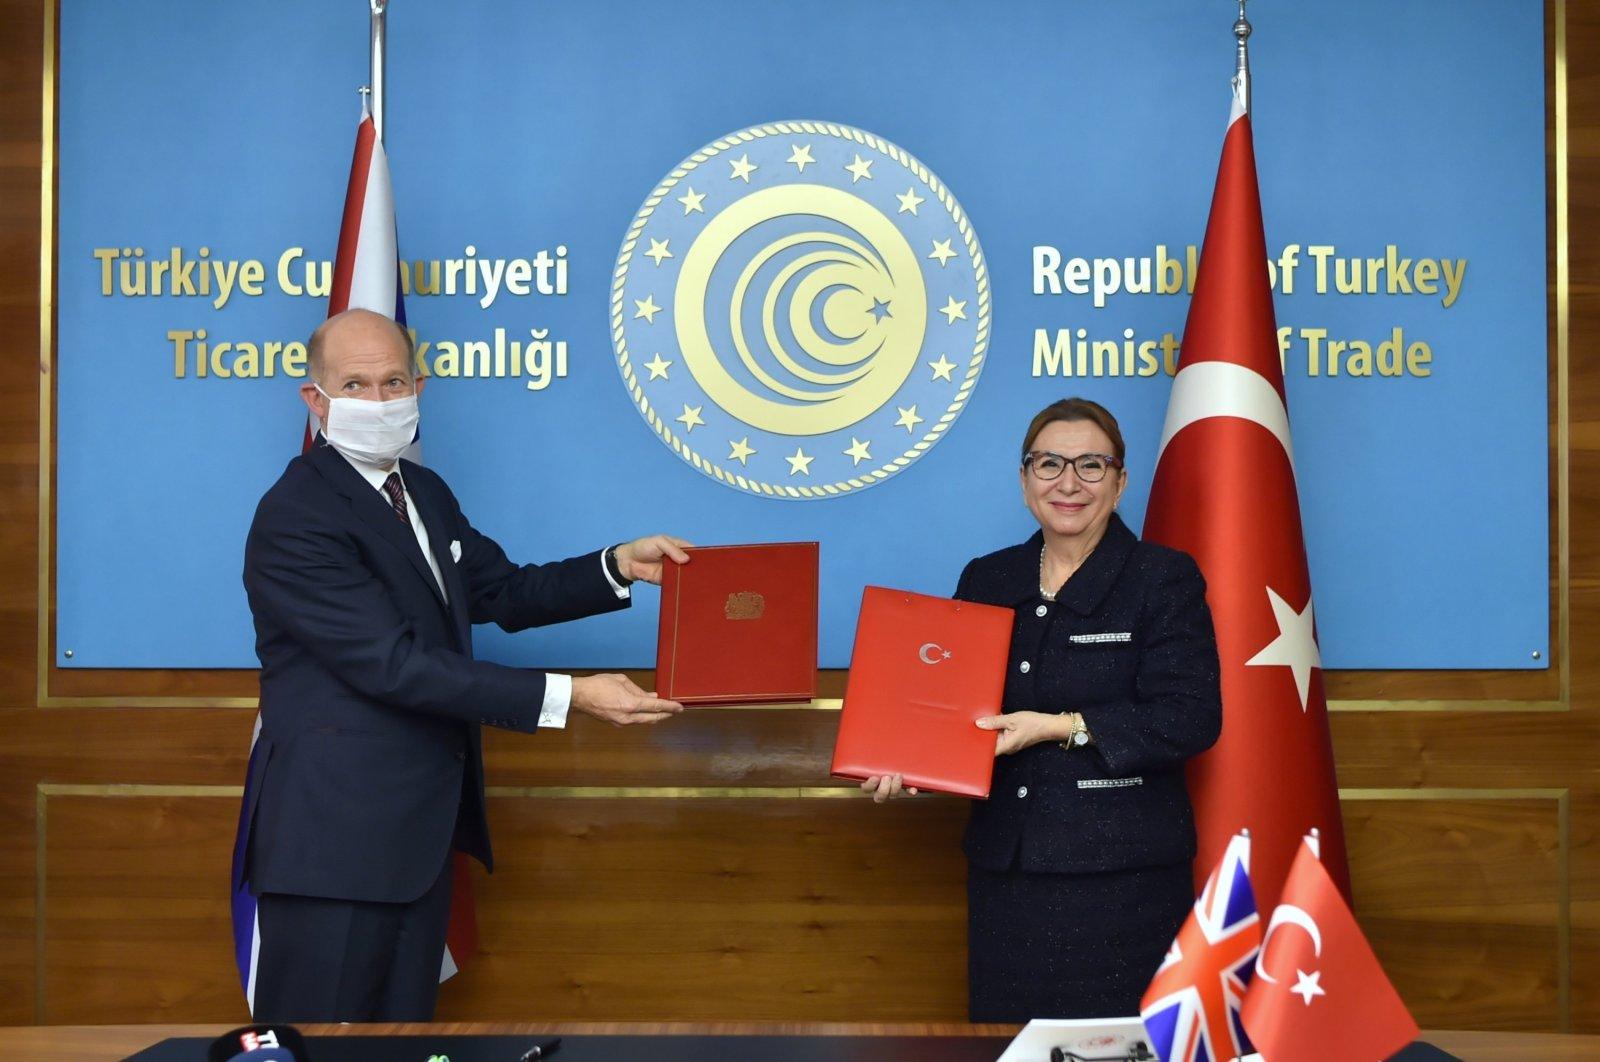 U.K. Ambassador to Ankara Dominick Chilcott (L) and Turkey's Trade Minister Ruhsar Pekcan at the signing ceremony of the Turkey-U.K. free trade agreement in the capital Ankara, Turkey, Dec. 29, 2020. (AA Photo)